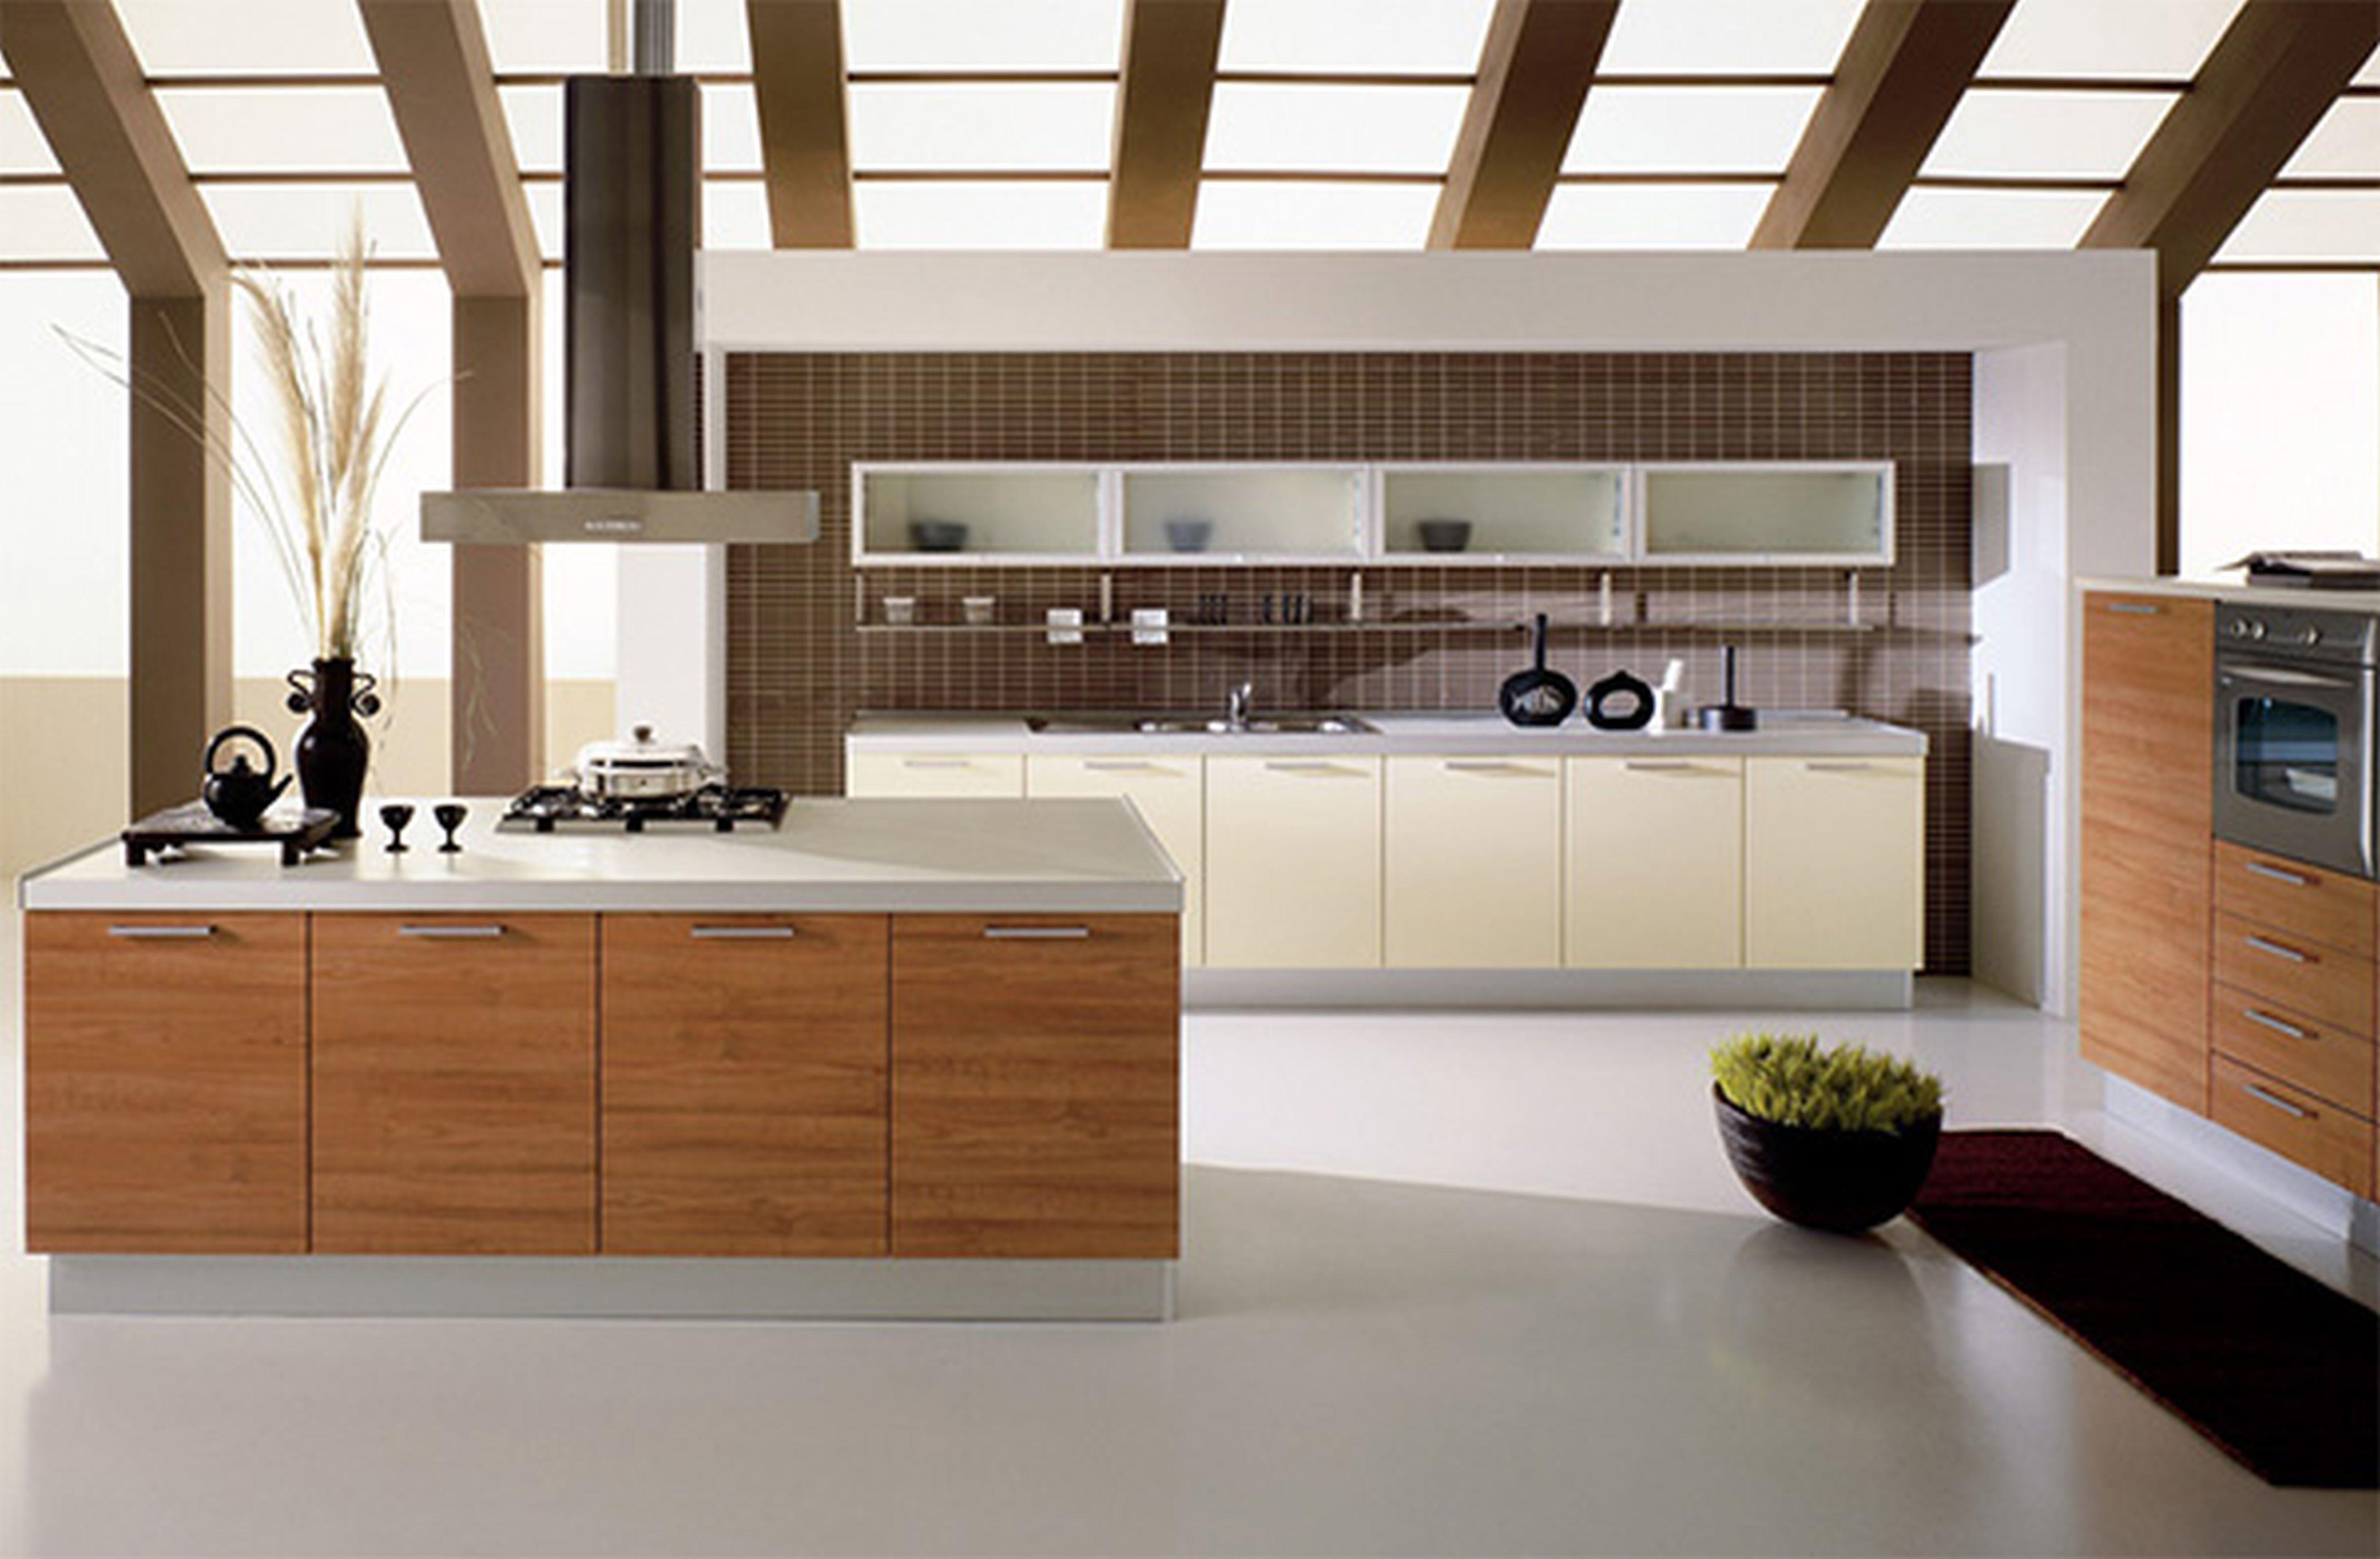 furniture kitchen exquisite beautiful contemporary kitchen design green building idea on kitchen ideas modern id=18499